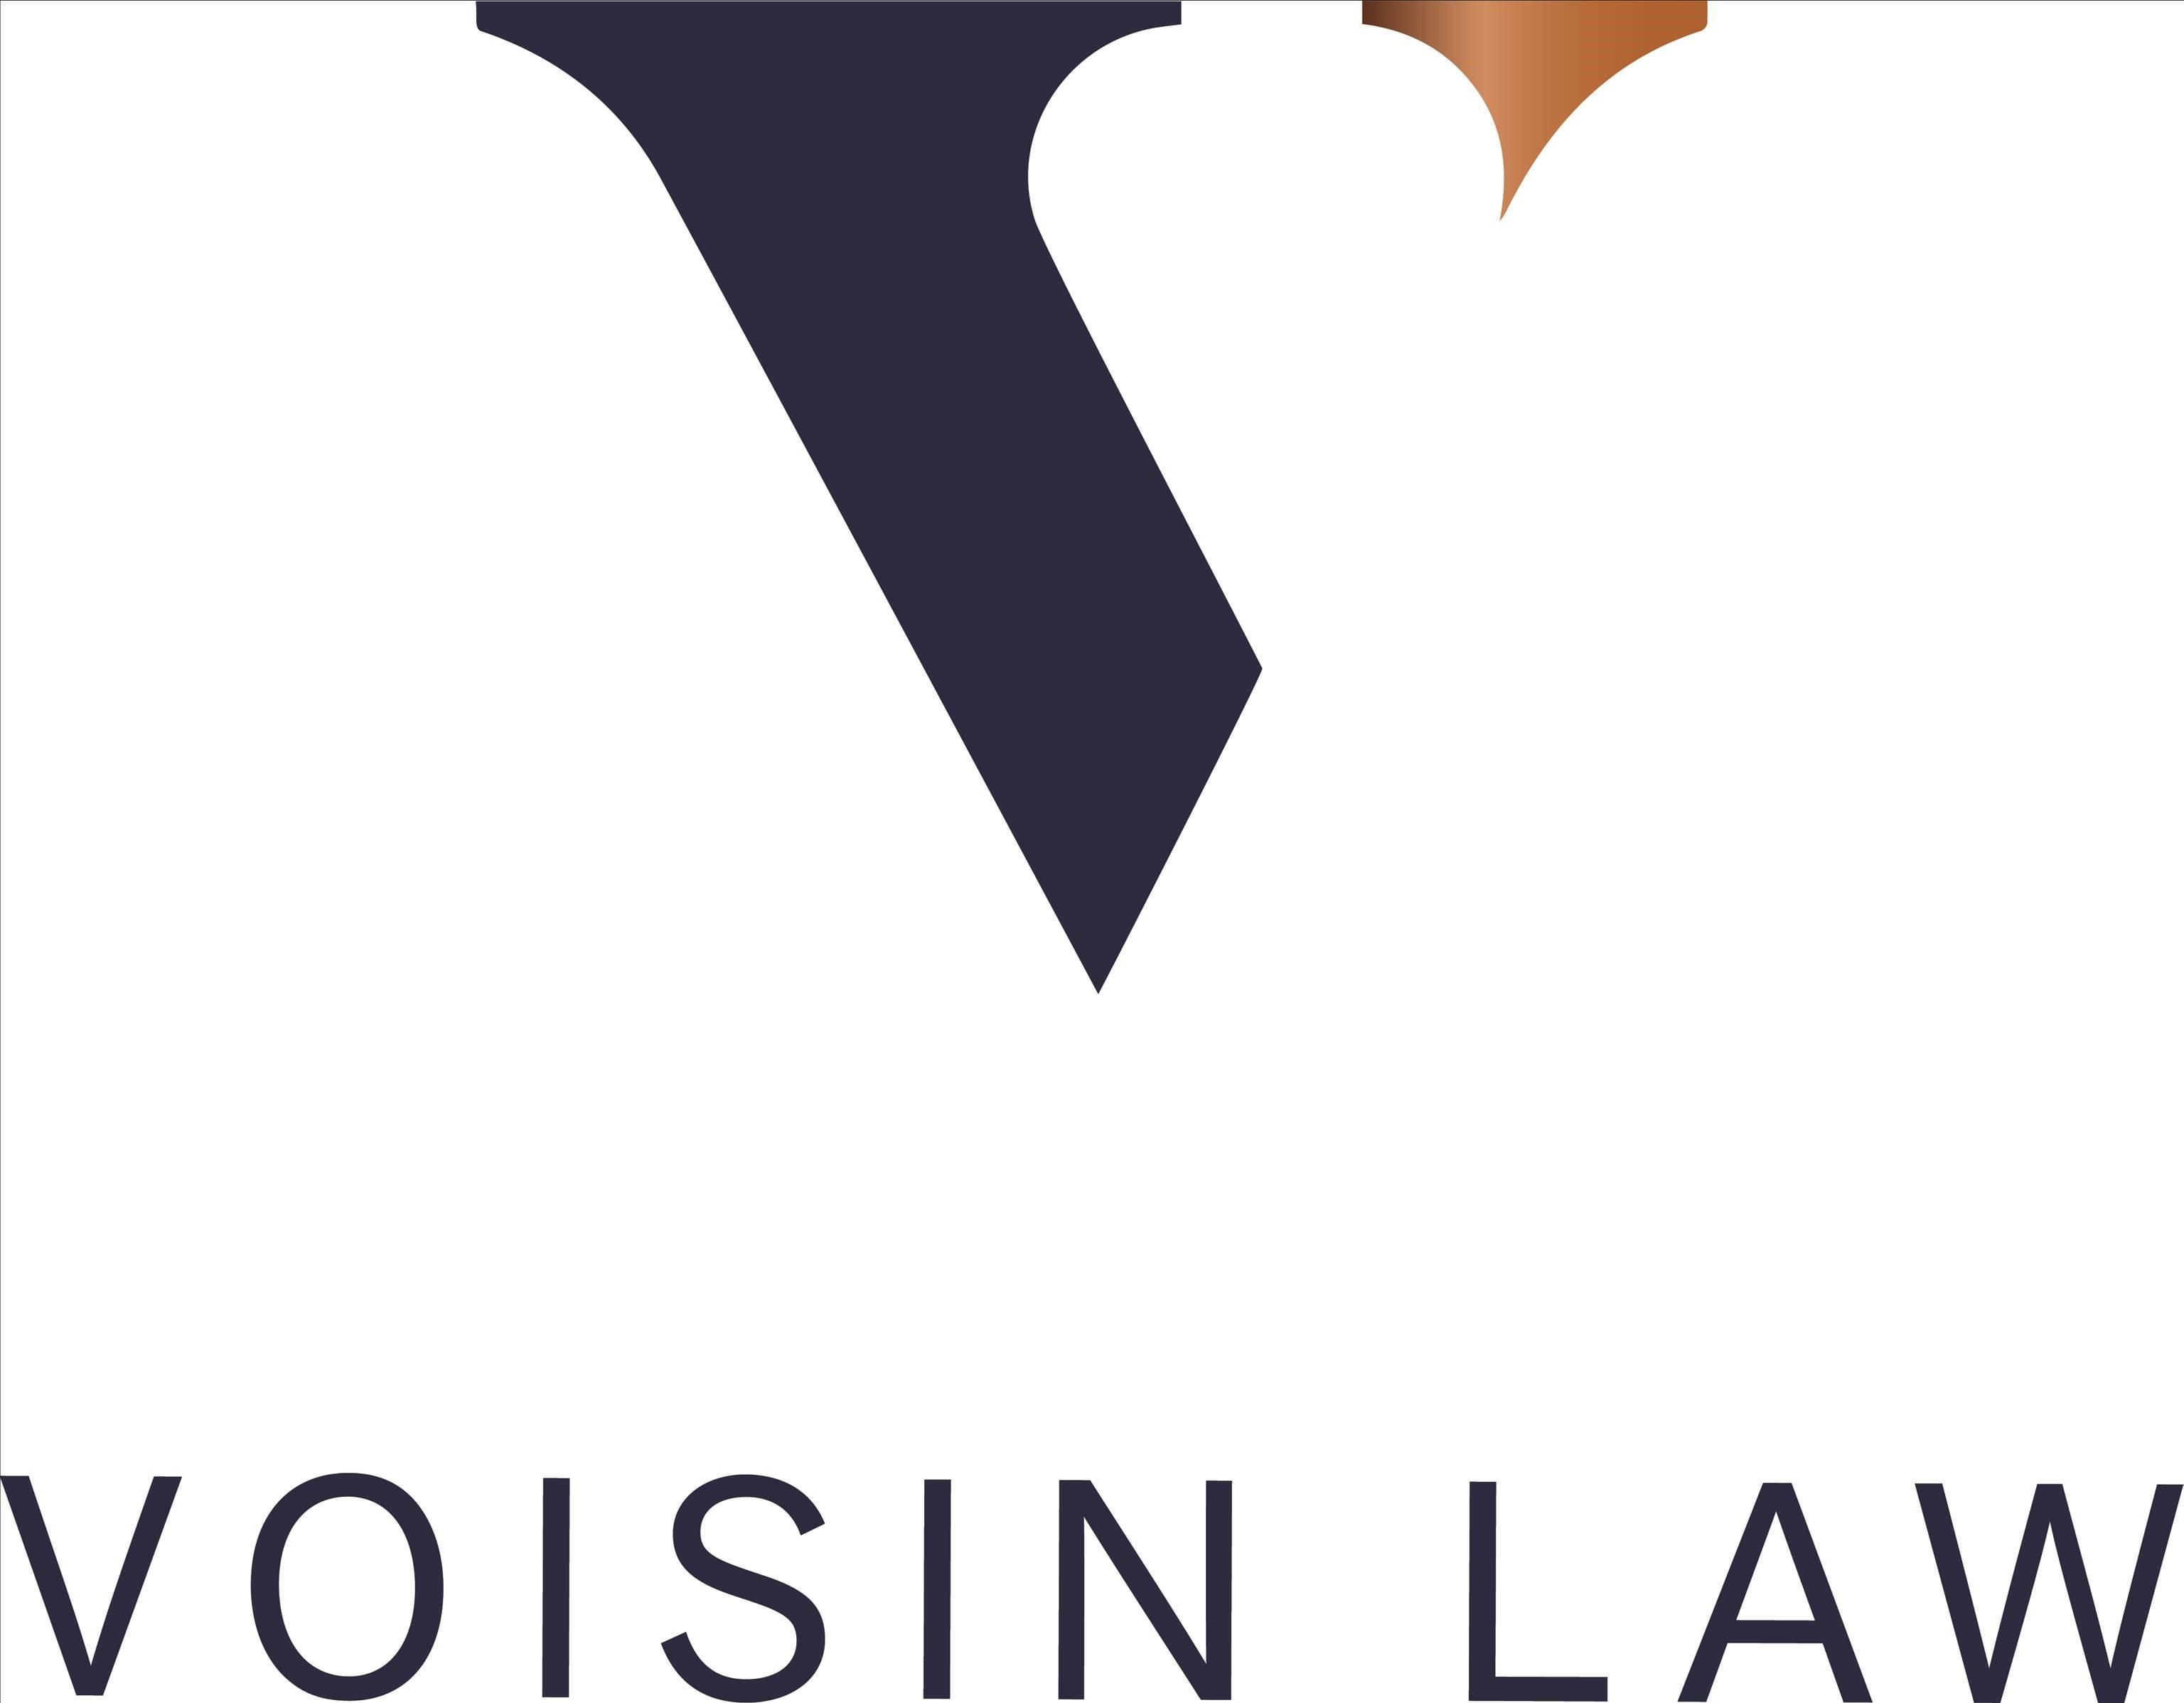 Voisin Law logo